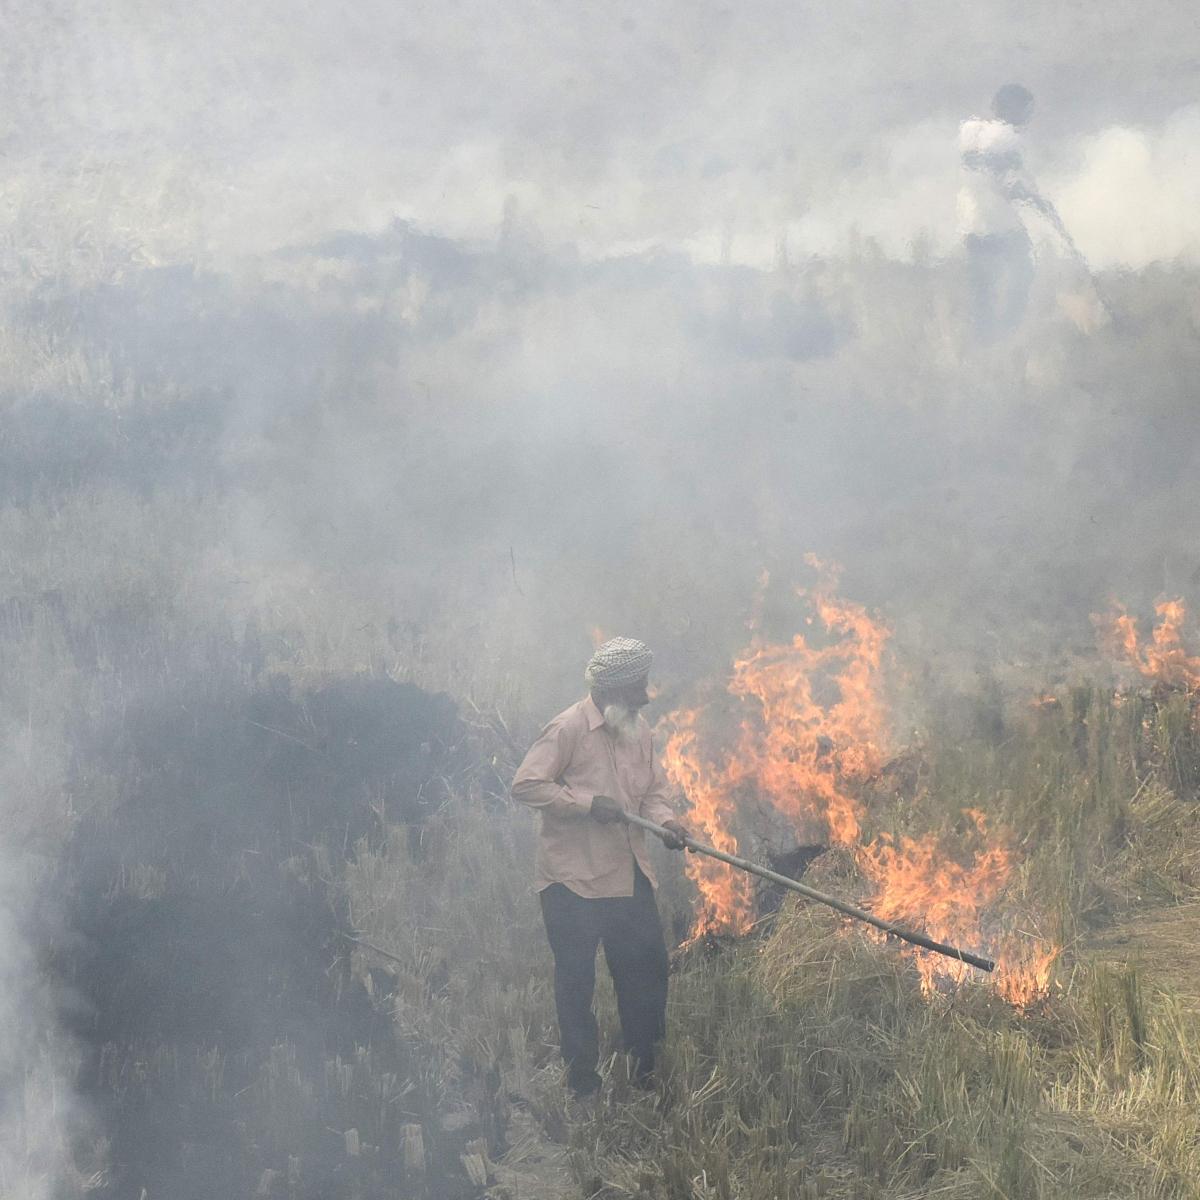 Delhi AQI 'very poor' as stubble burning spikes